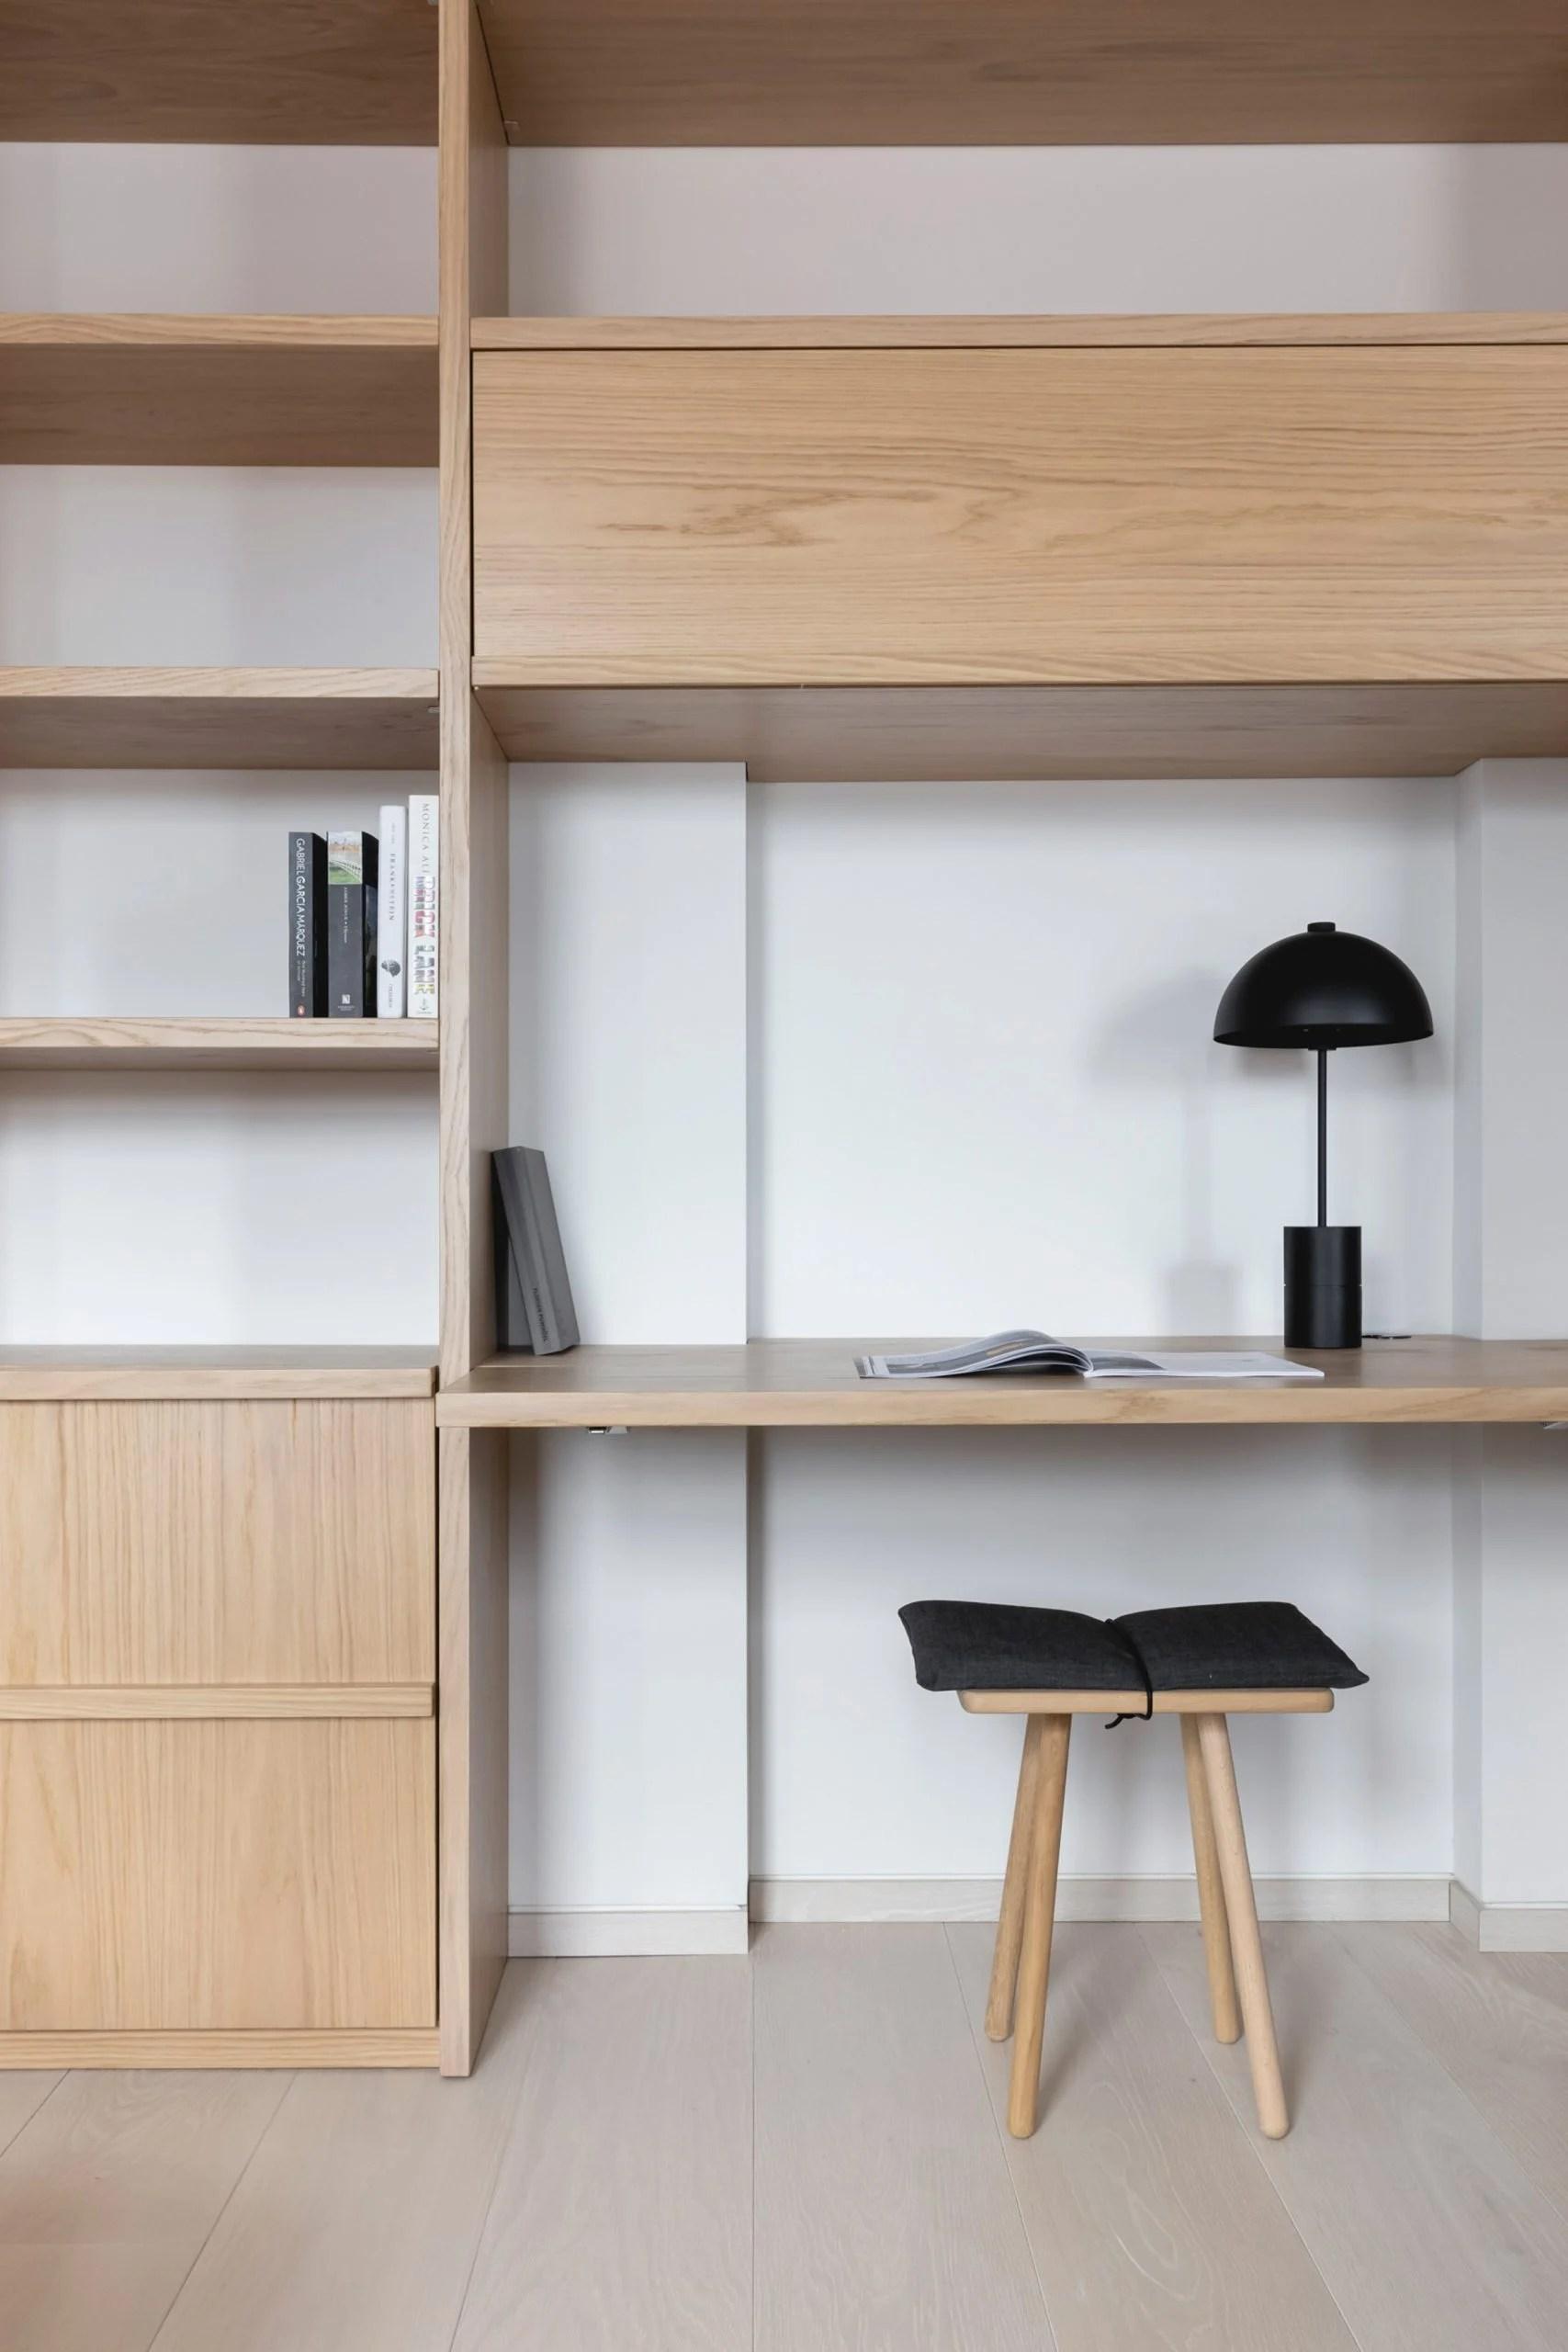 Built-in wooden storage in Mayfair pied-à-terre interior by MWAI